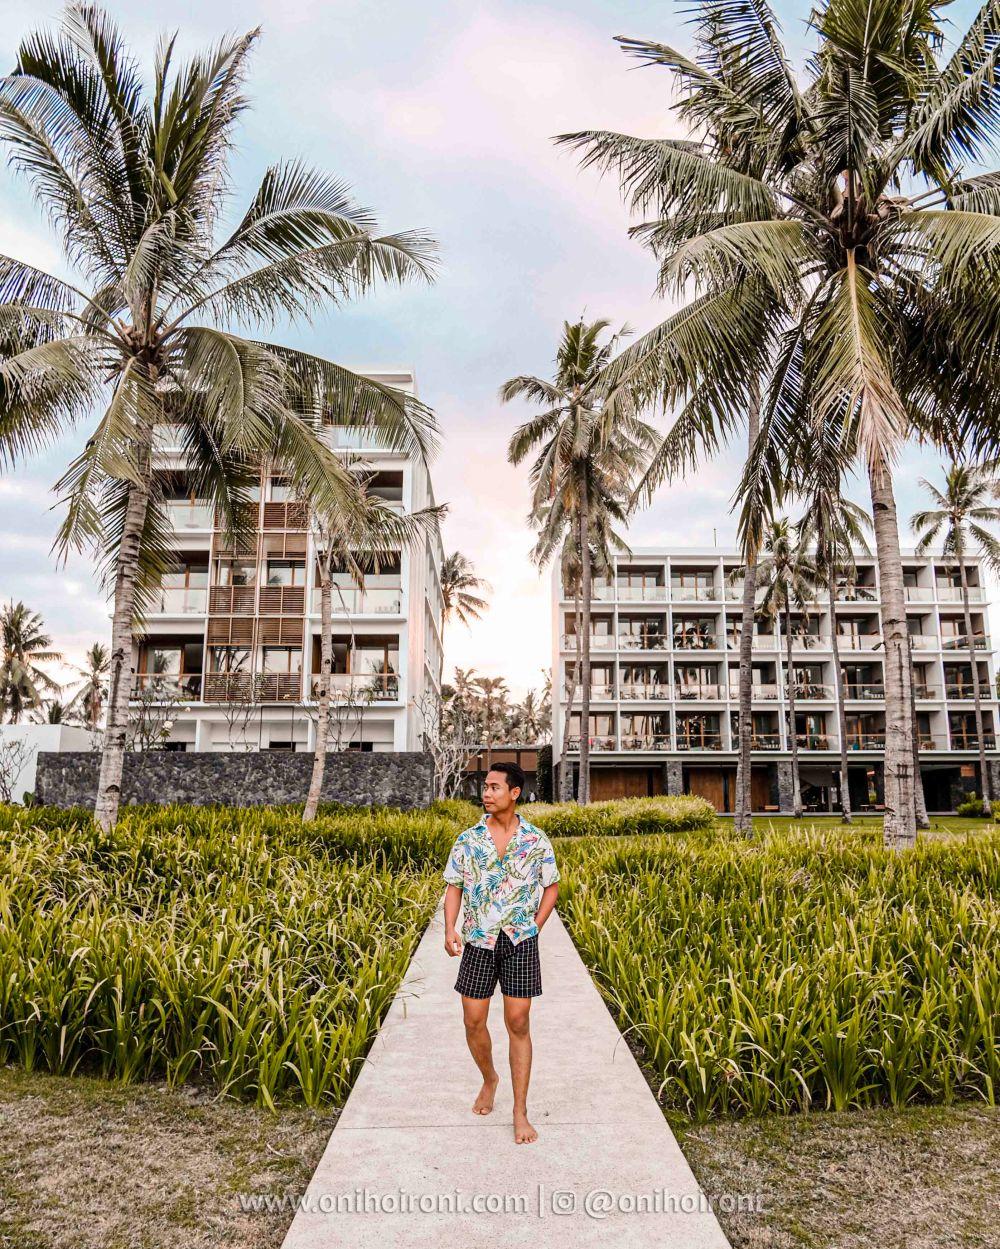 3 Spot instagramable Review Hotel Dialoog Banyuwangi oni hoironi